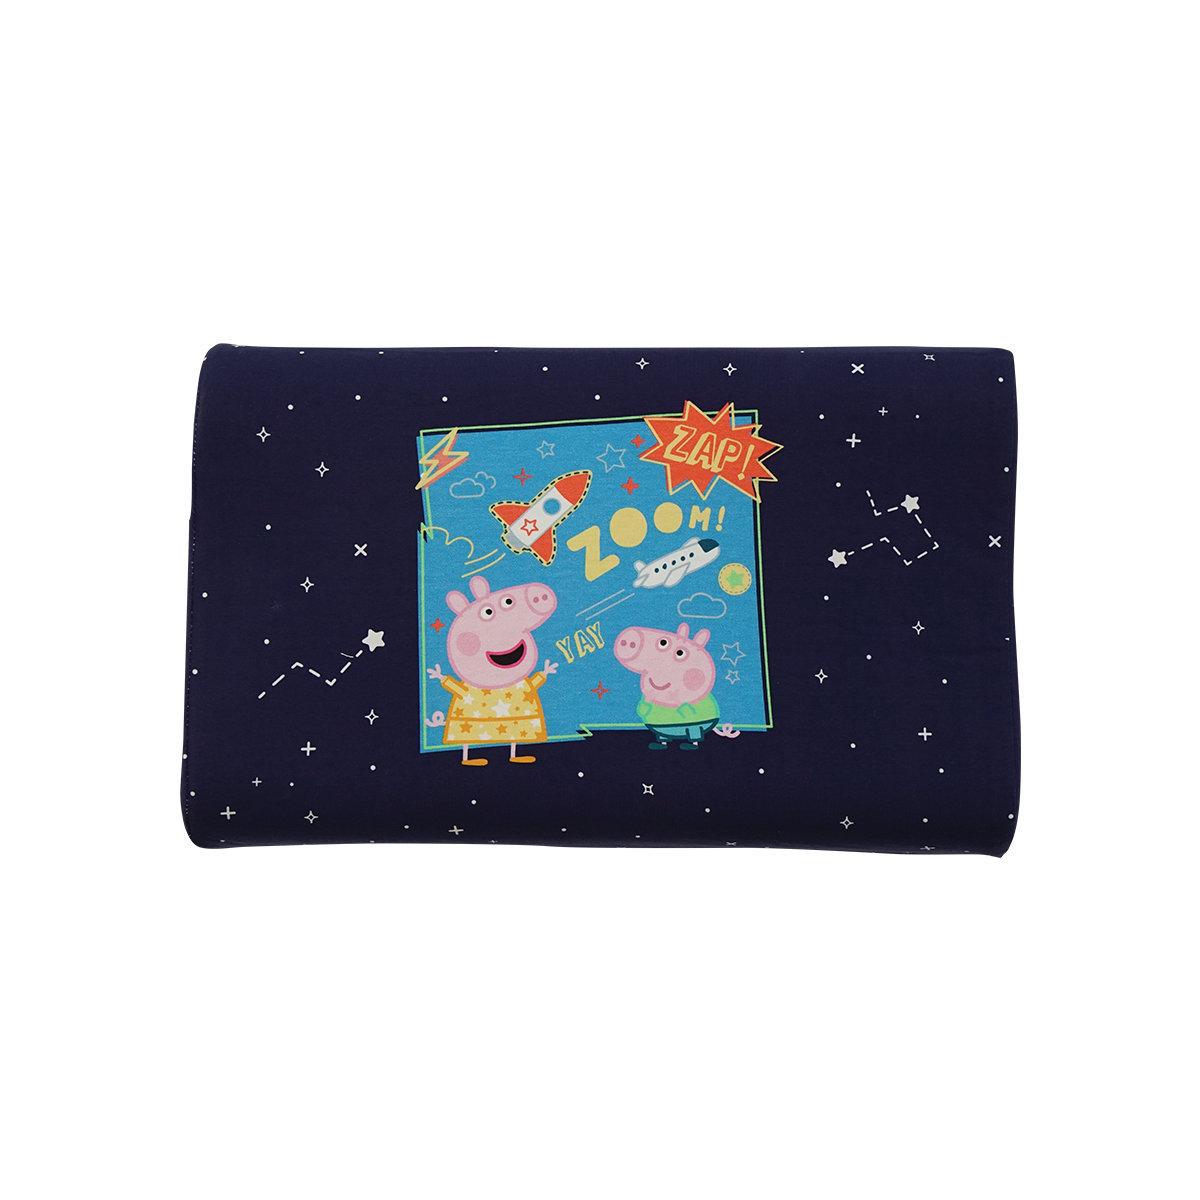 Peppa Pig U.6兒童枕 5-10歲-深藍 『透氣舒適、防塵防蟎、呵護頸椎!』泰國直送